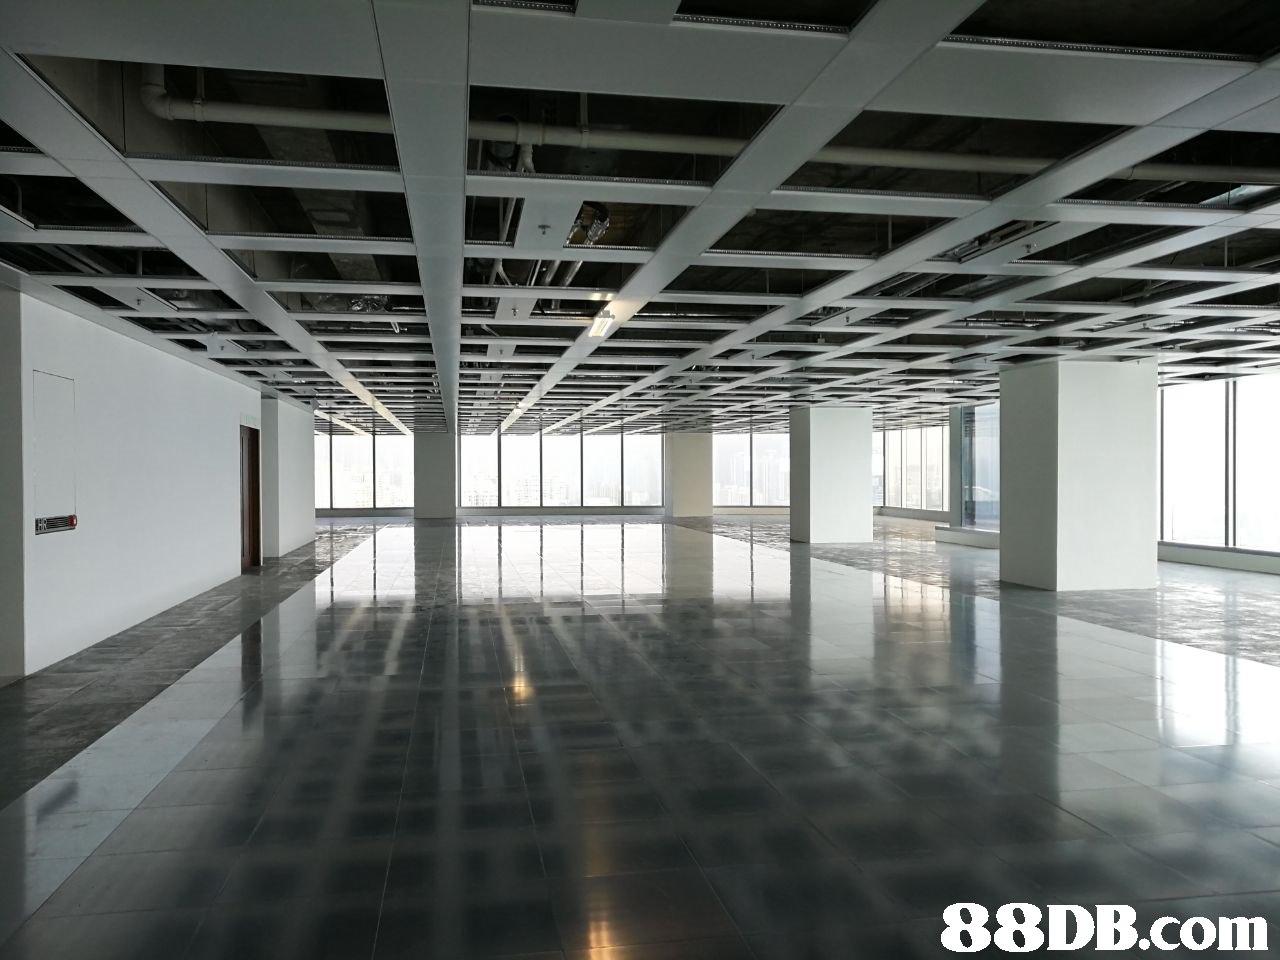 Building,Architecture,Light,Daylighting,Lobby